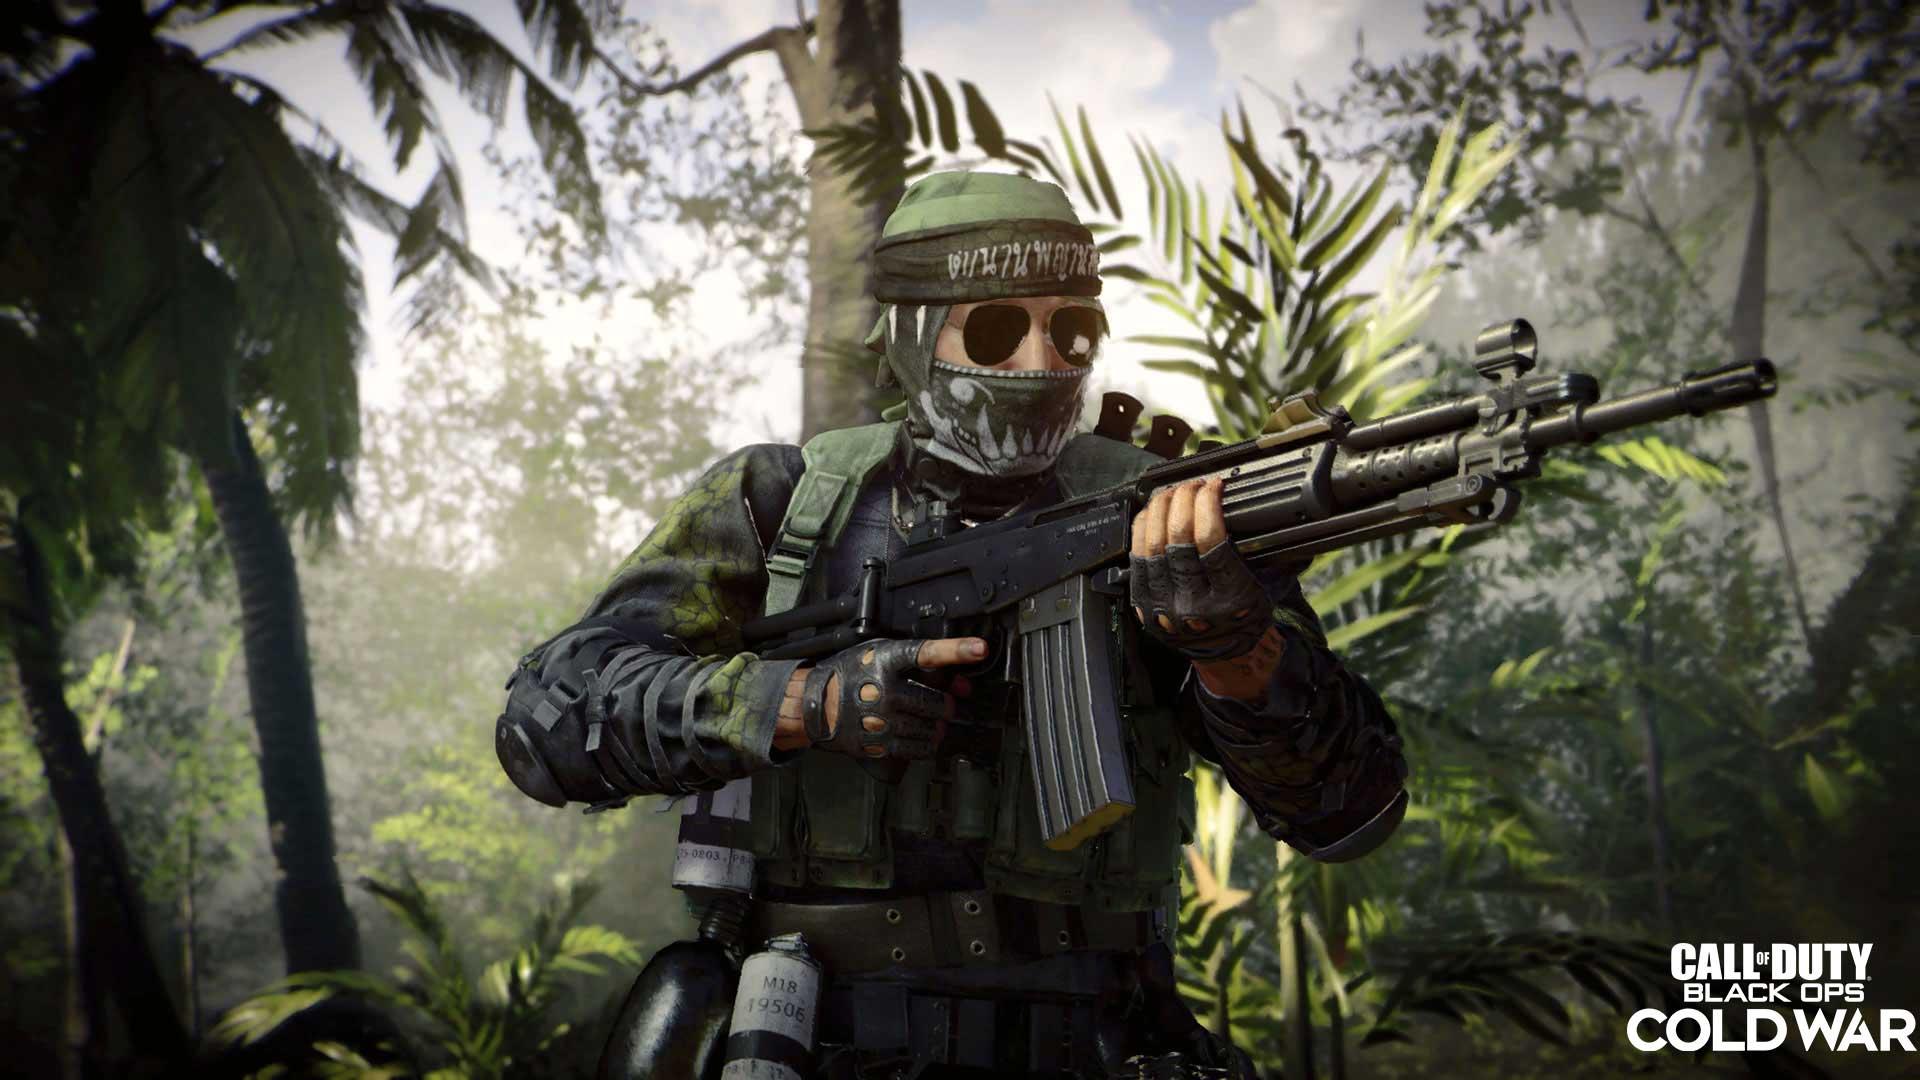 Soldado de Call of Duty: Black Ops Cold War se movendo na floresta